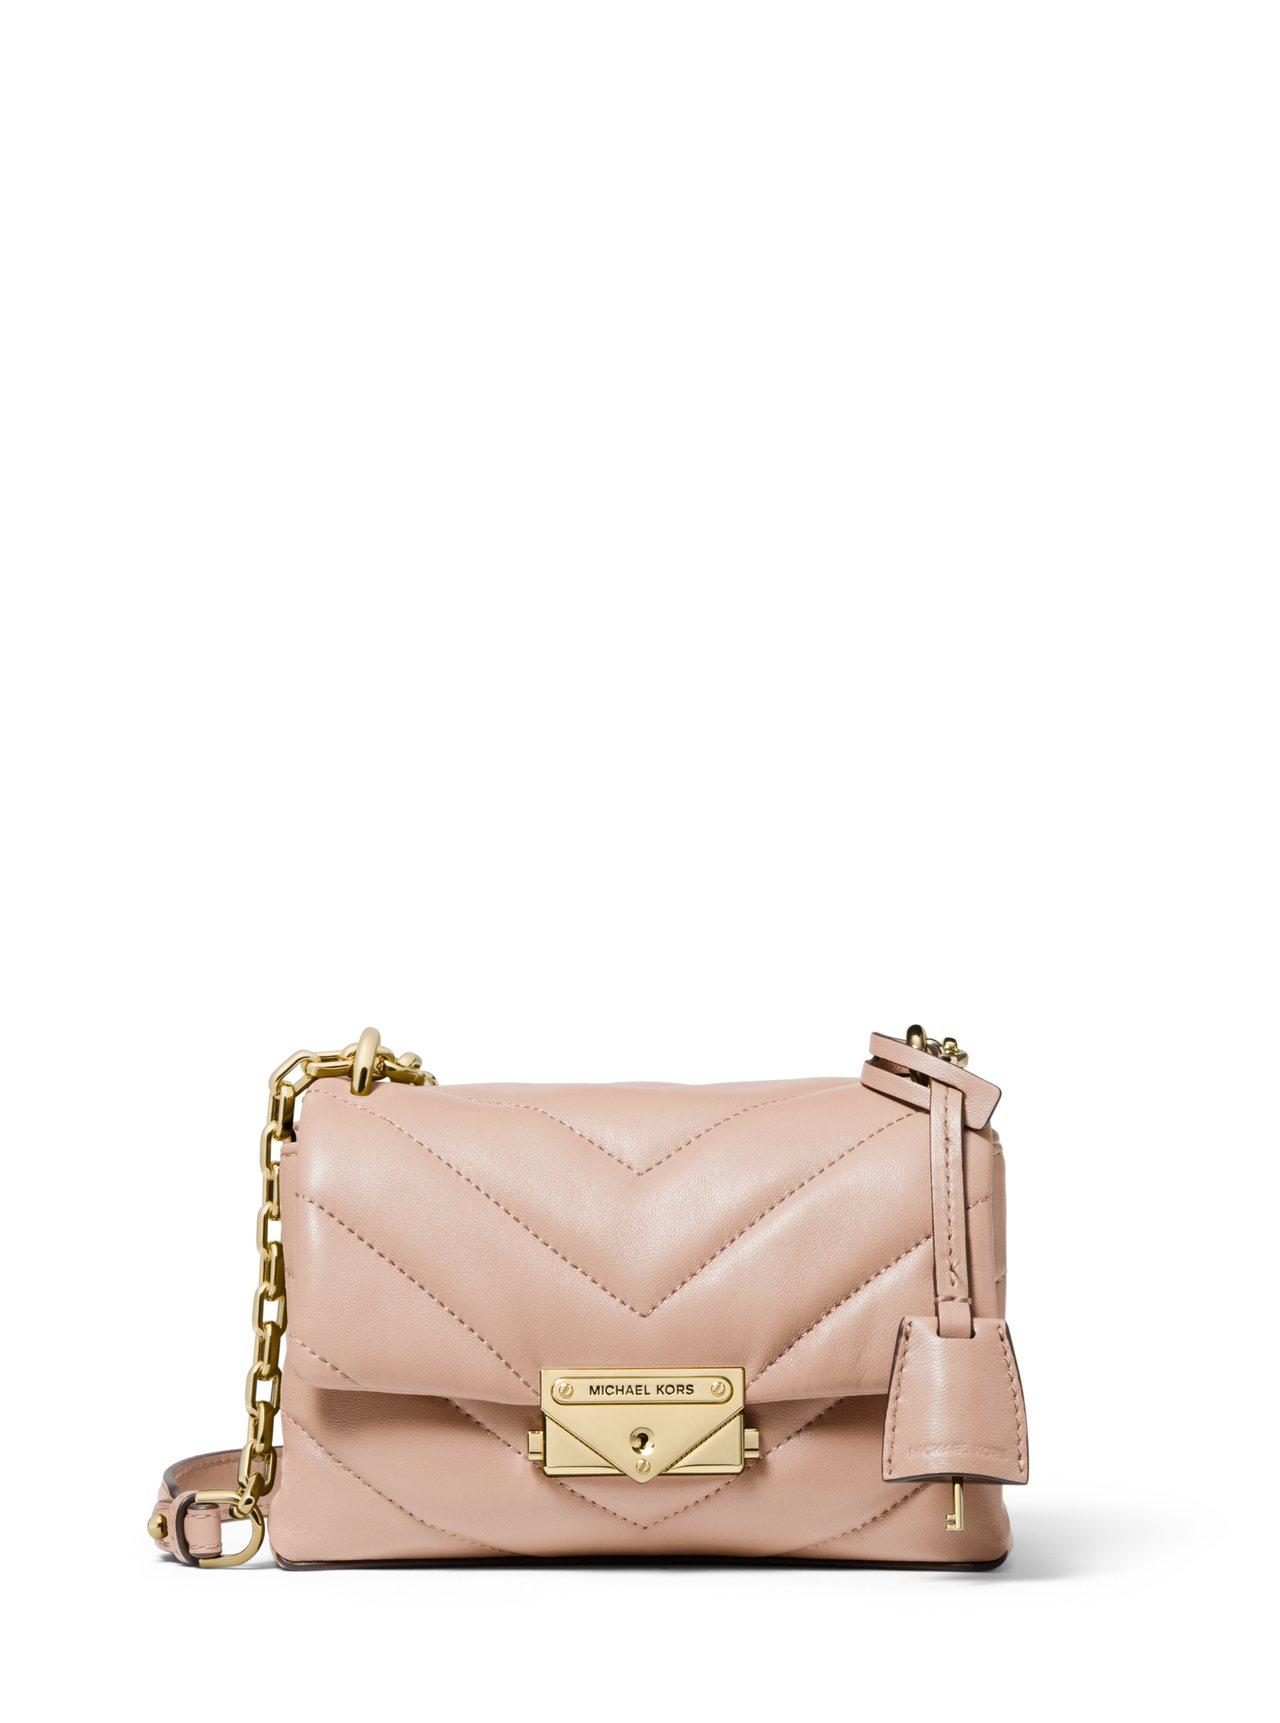 CECE粉膚色縫衍小羊皮鍊包,售價14,000元。圖/MICHAEL KORS提...